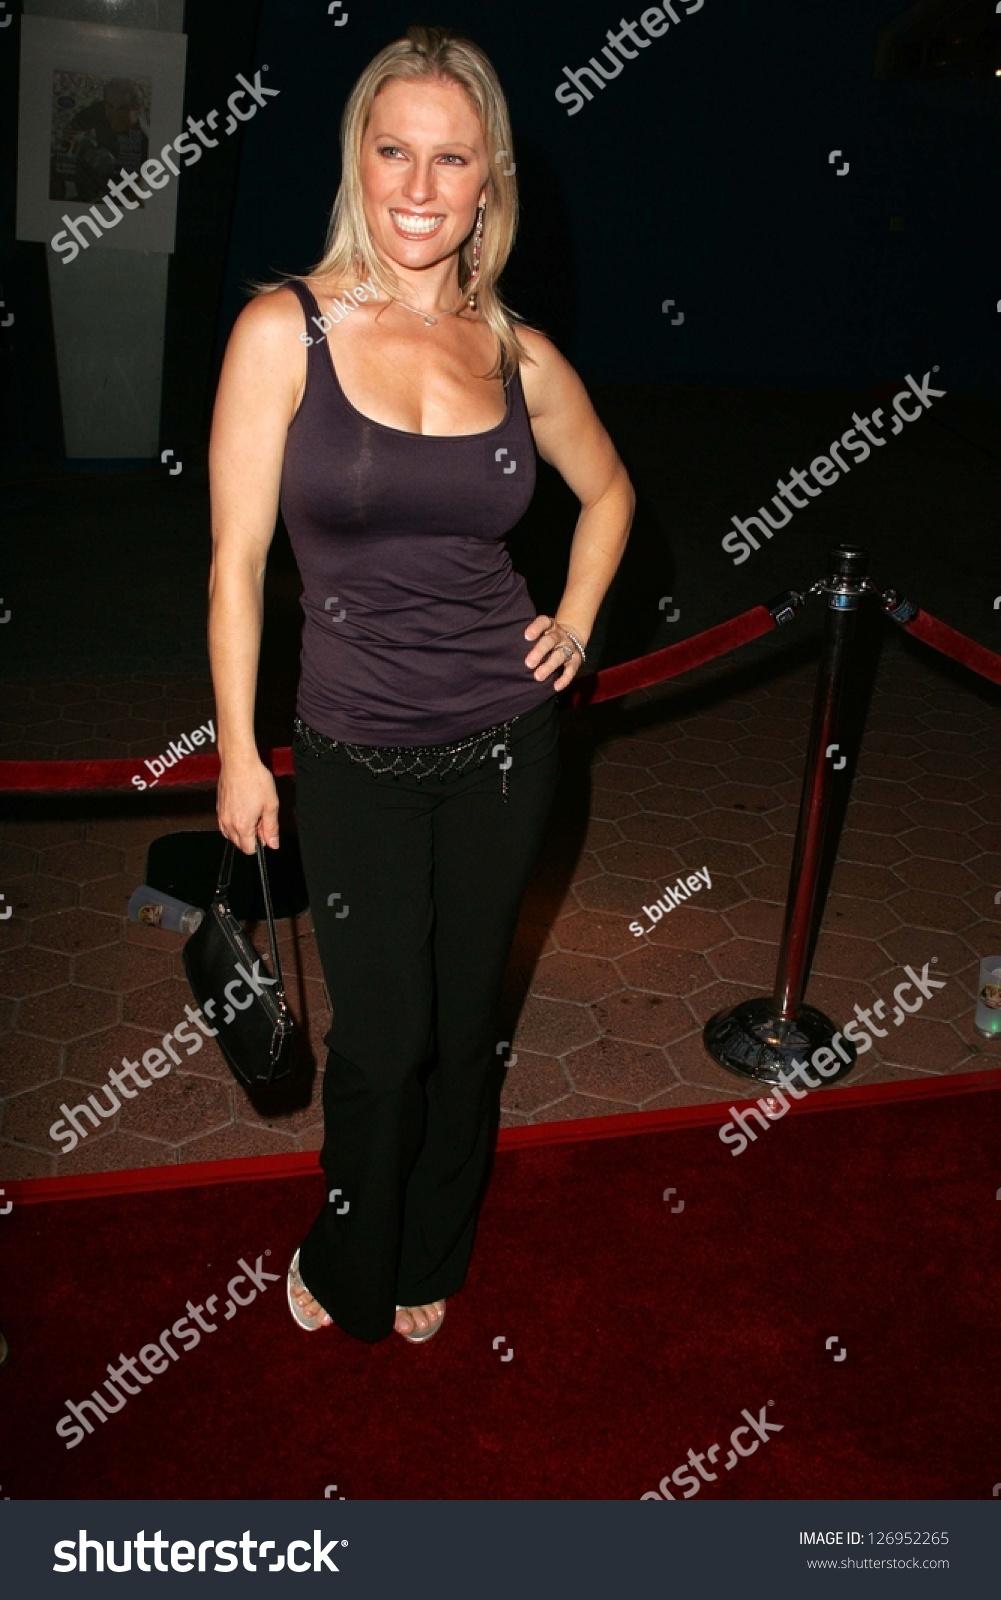 Nicole Logan